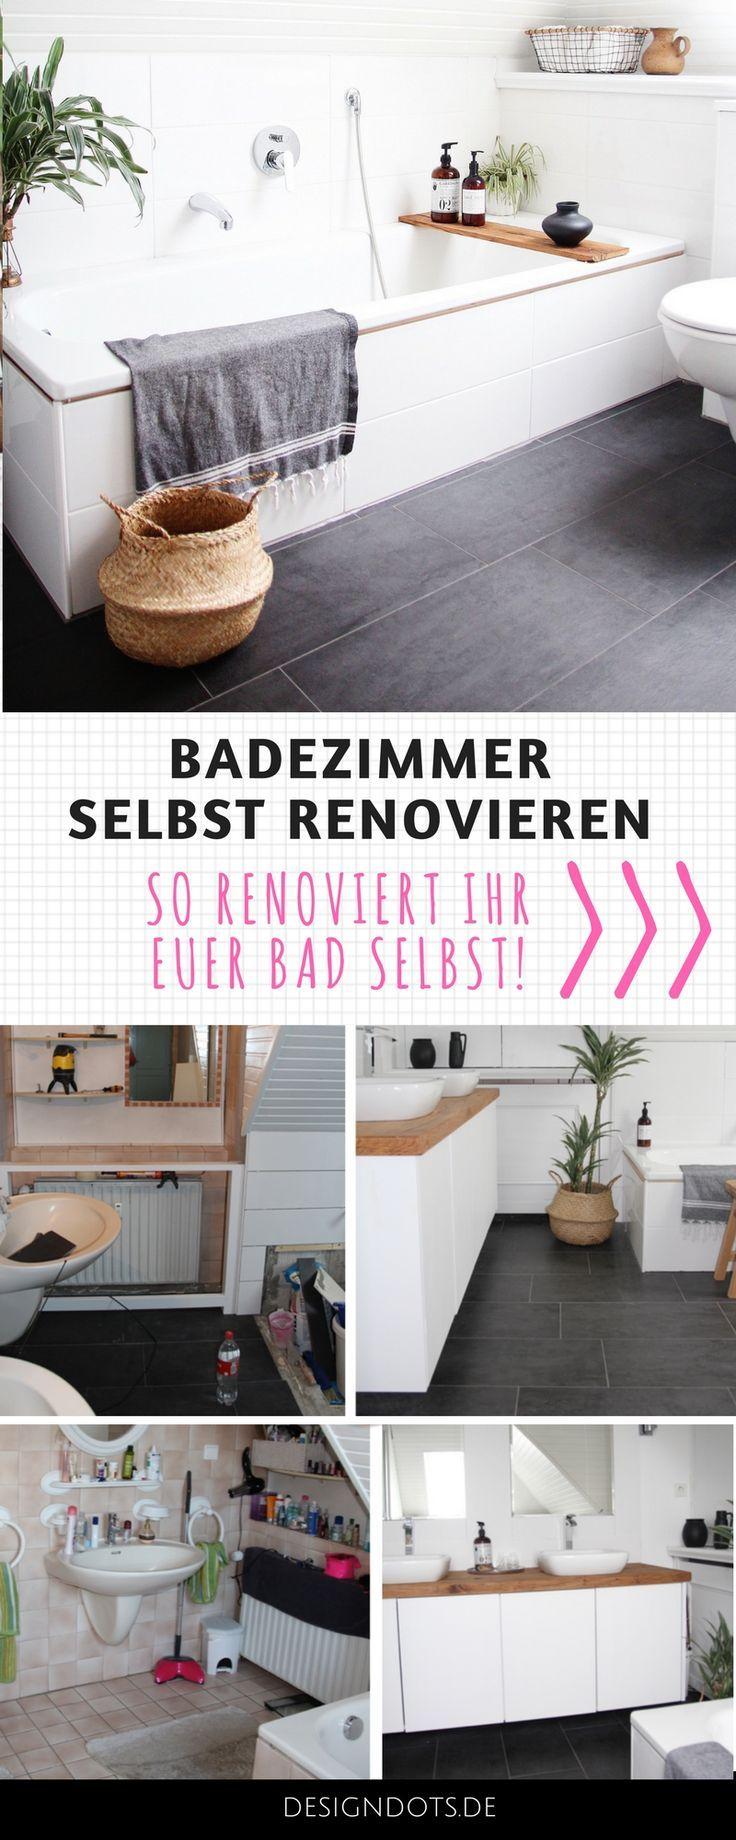 Hottest Photographs Bathroom Renovations Diy Popular Badezimmer Renovieren Hausrenovierung Bad Renovieren Kosten